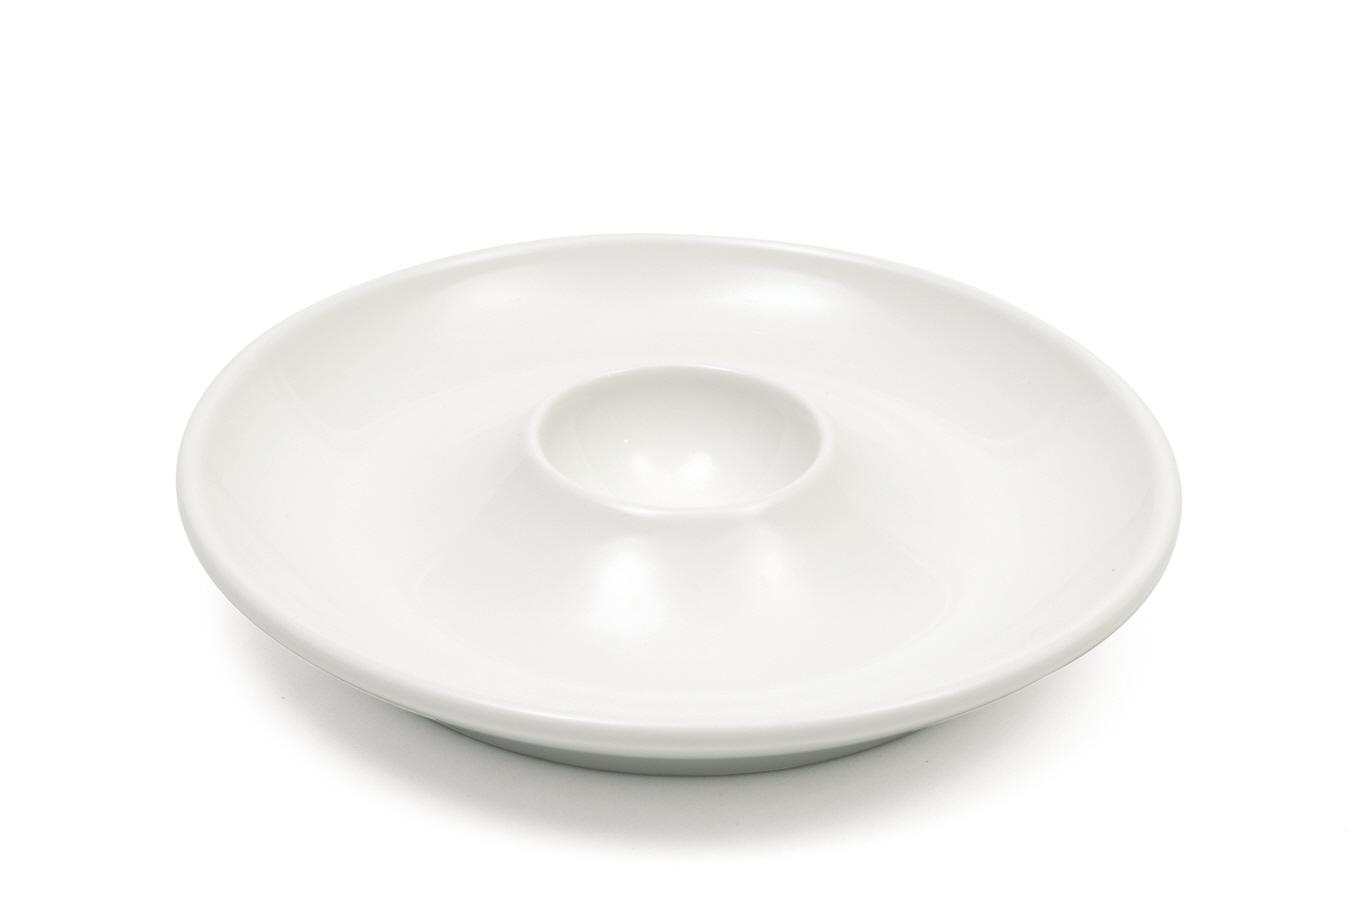 Porcelánový Talířek na vejce White Basics - Maxwell&Williams